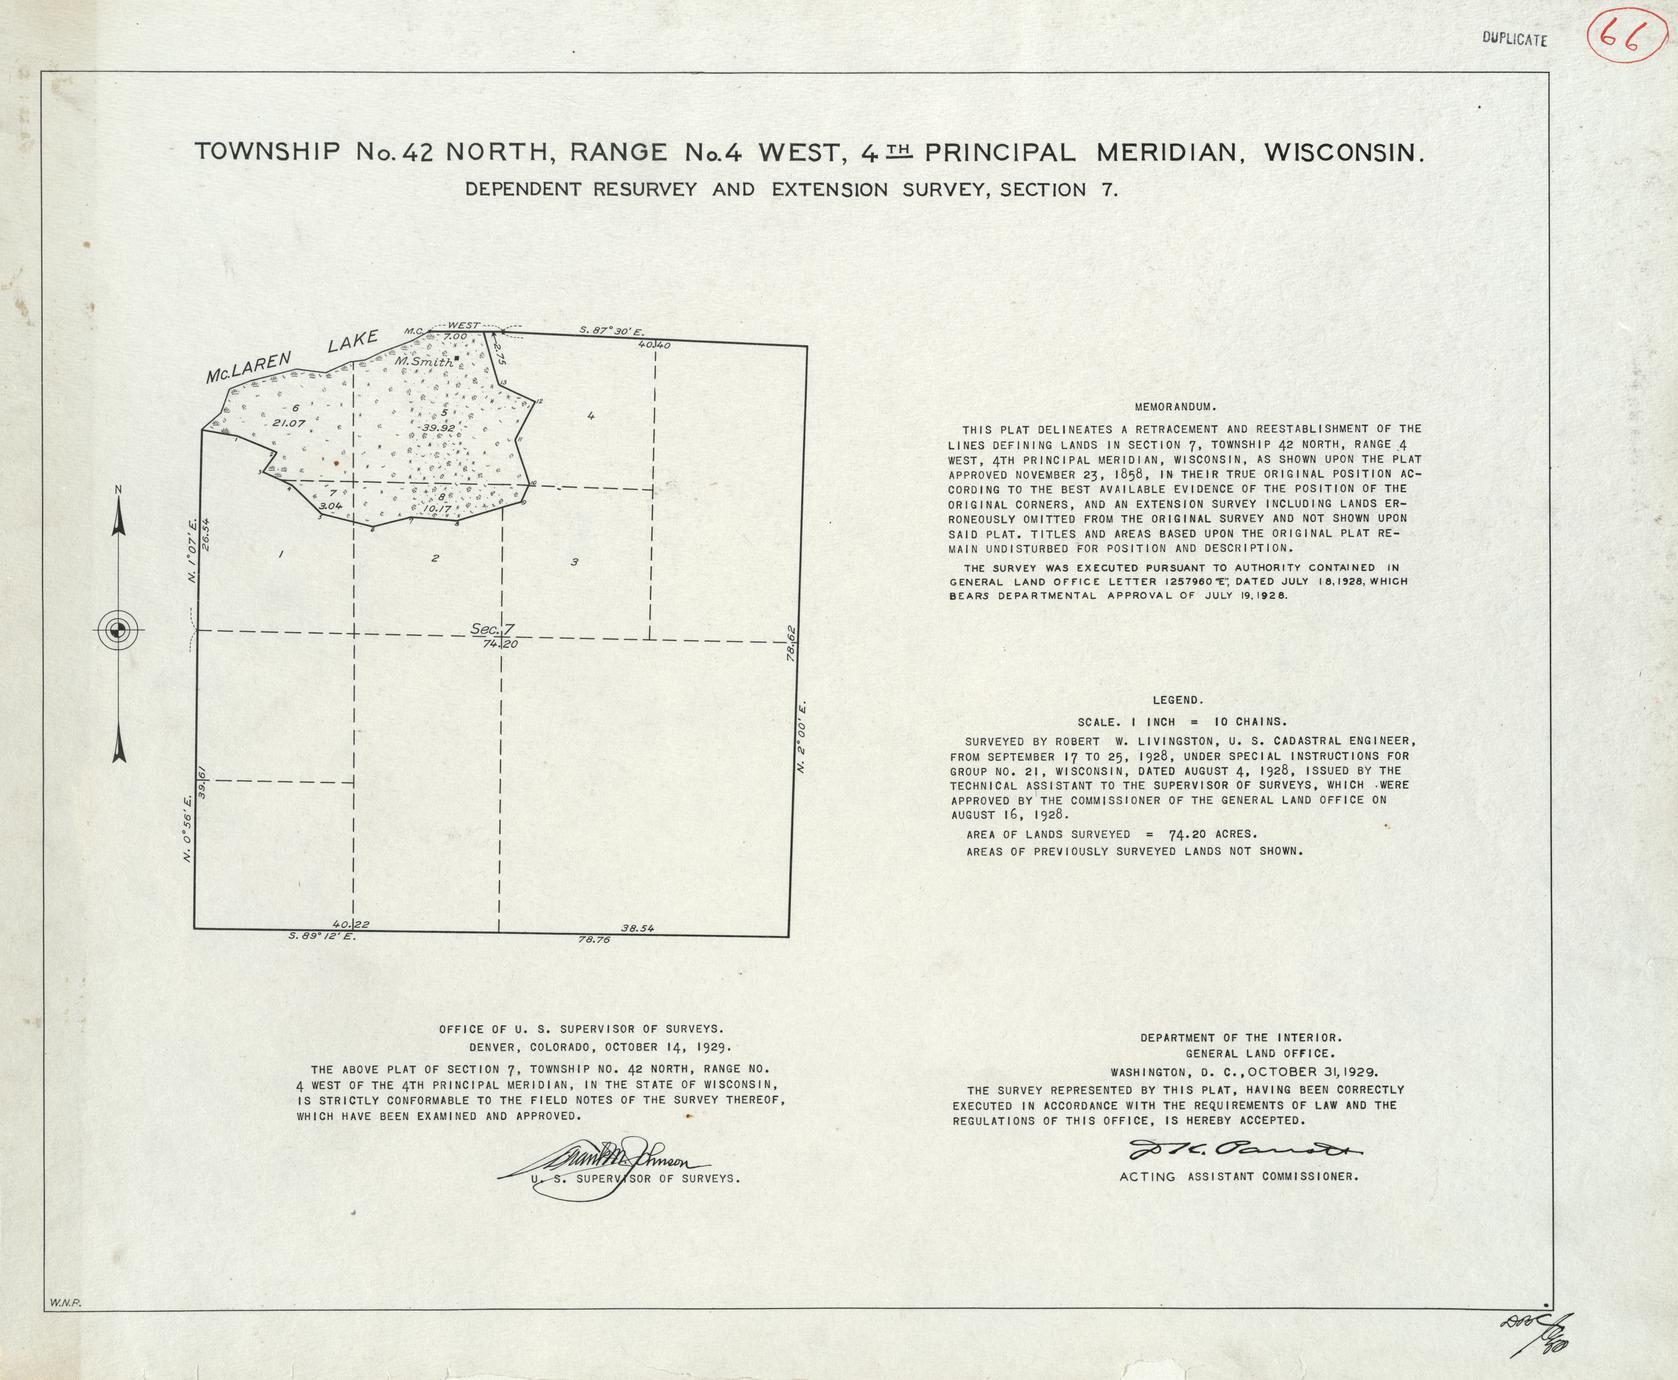 [Public Land Survey System map: Wisconsin Township 42 North, Range 04 West]